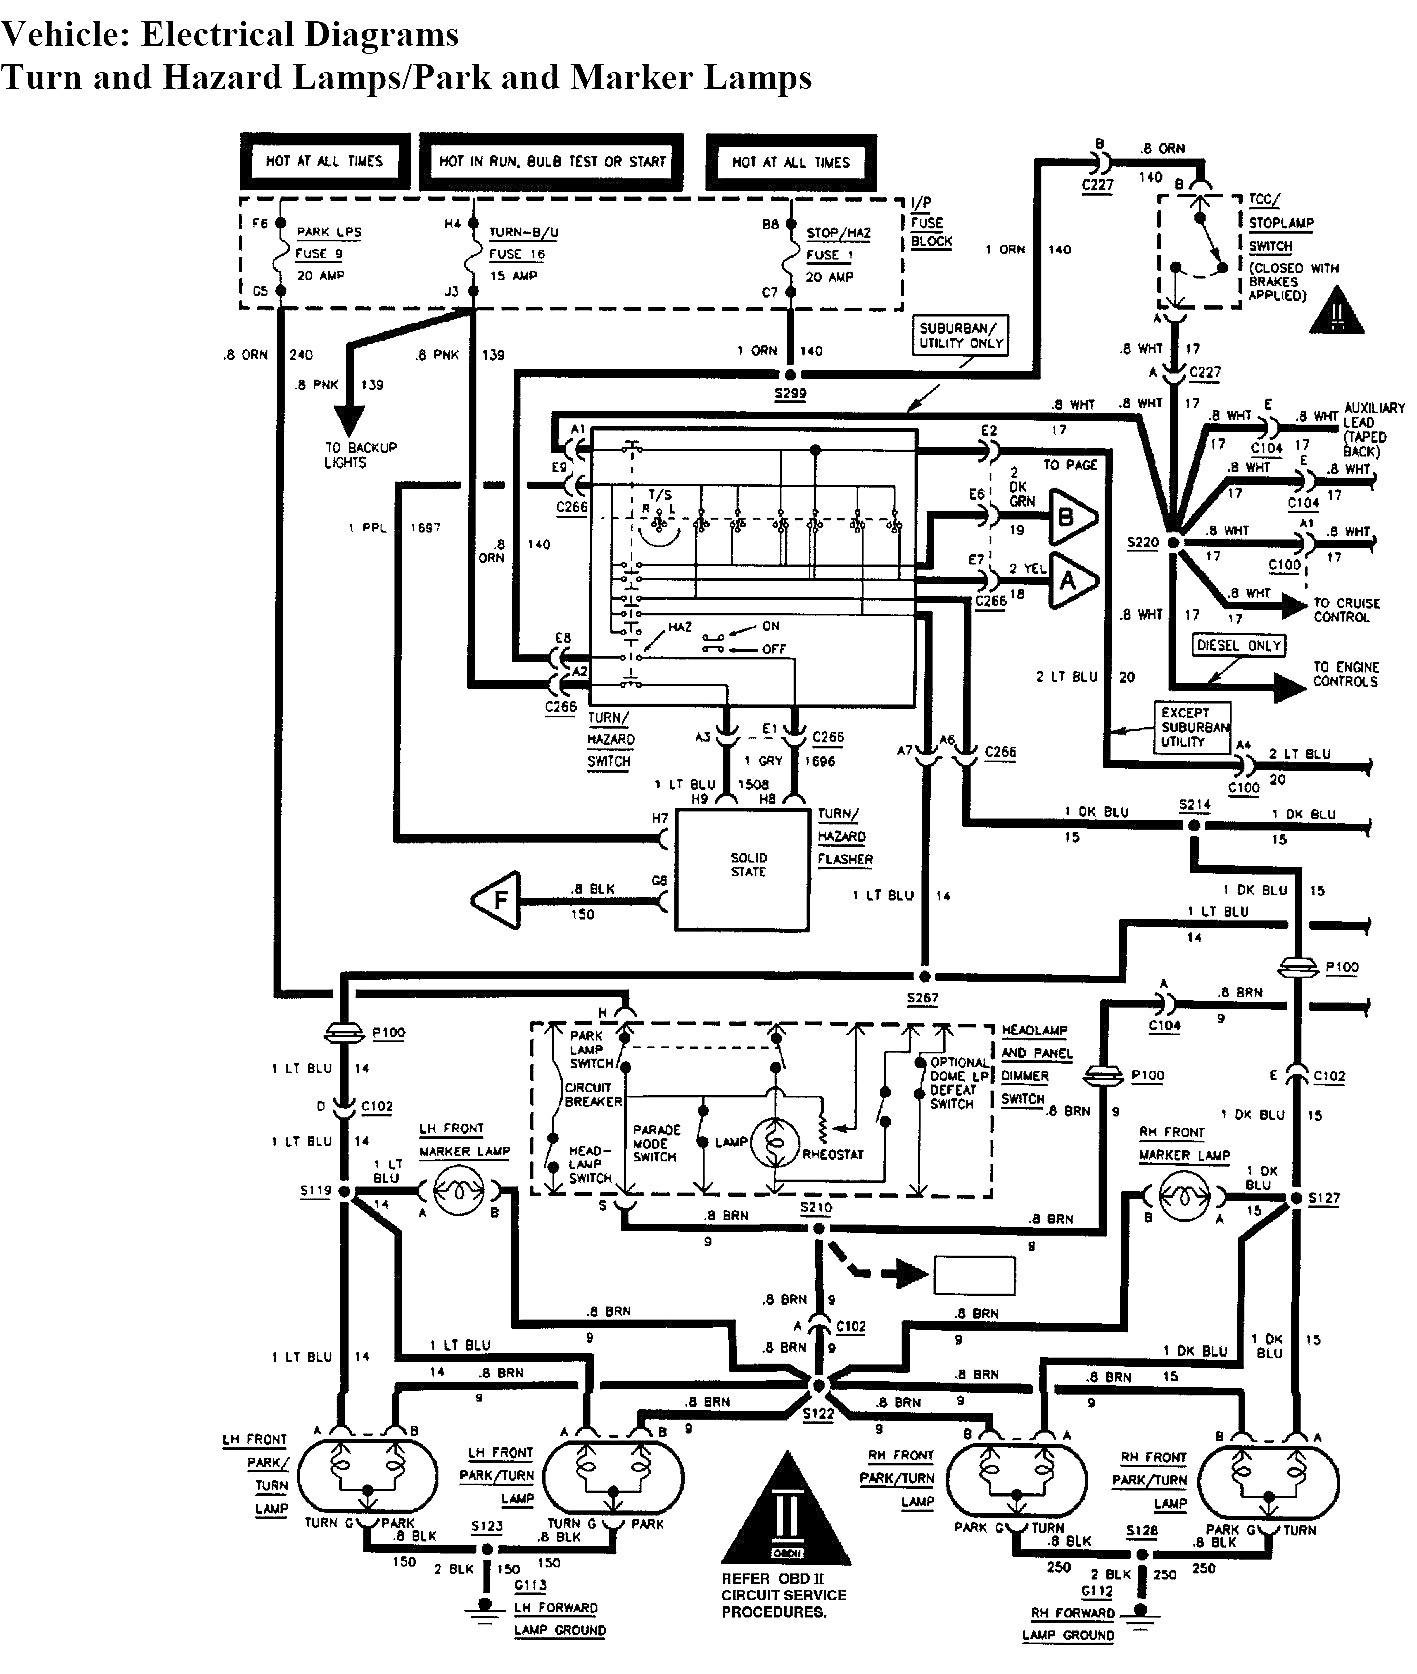 Diagram 1993 Chevy Tail Light Wiring Diagram Full Version Hd Quality Wiring Diagram Diagramtrishv Lamorefamale It